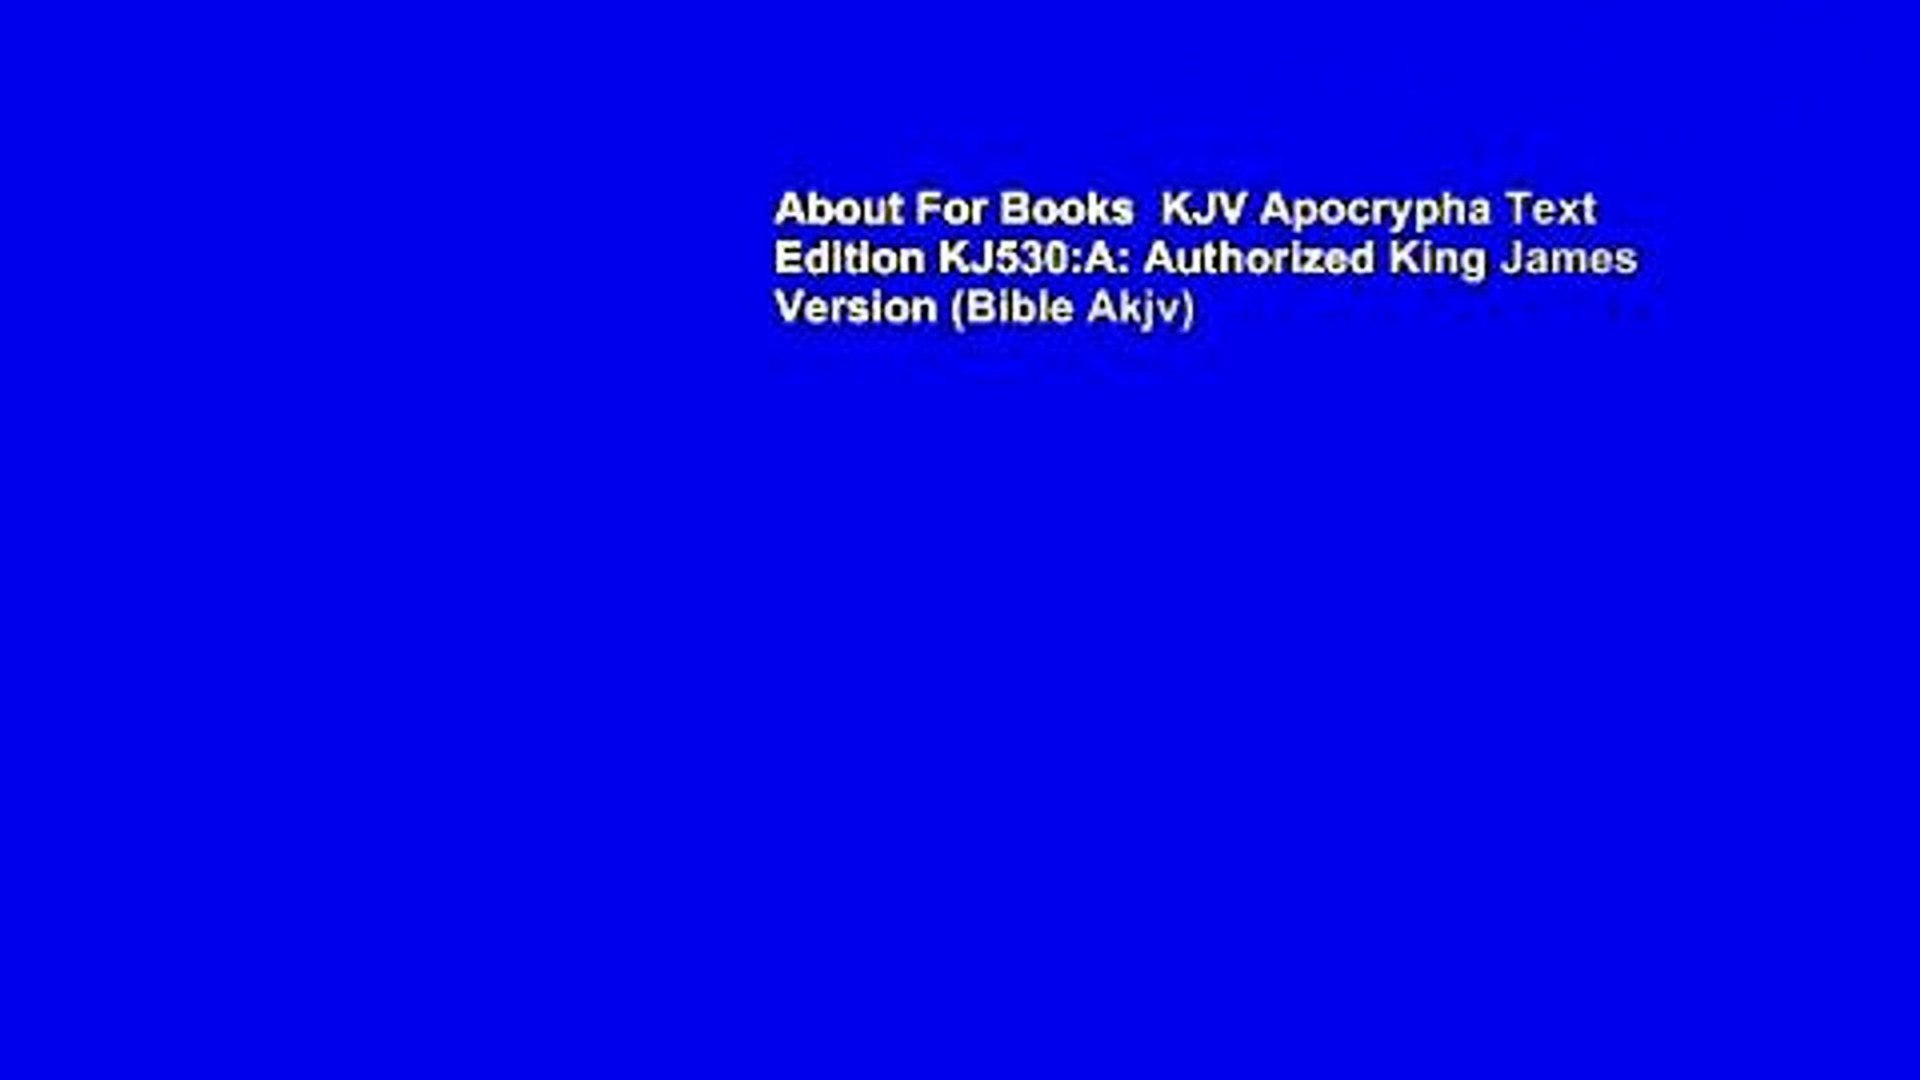 About For Books KJV Apocrypha Text Edition KJ530:A: Authorized King James  Version (Bible Akjv)